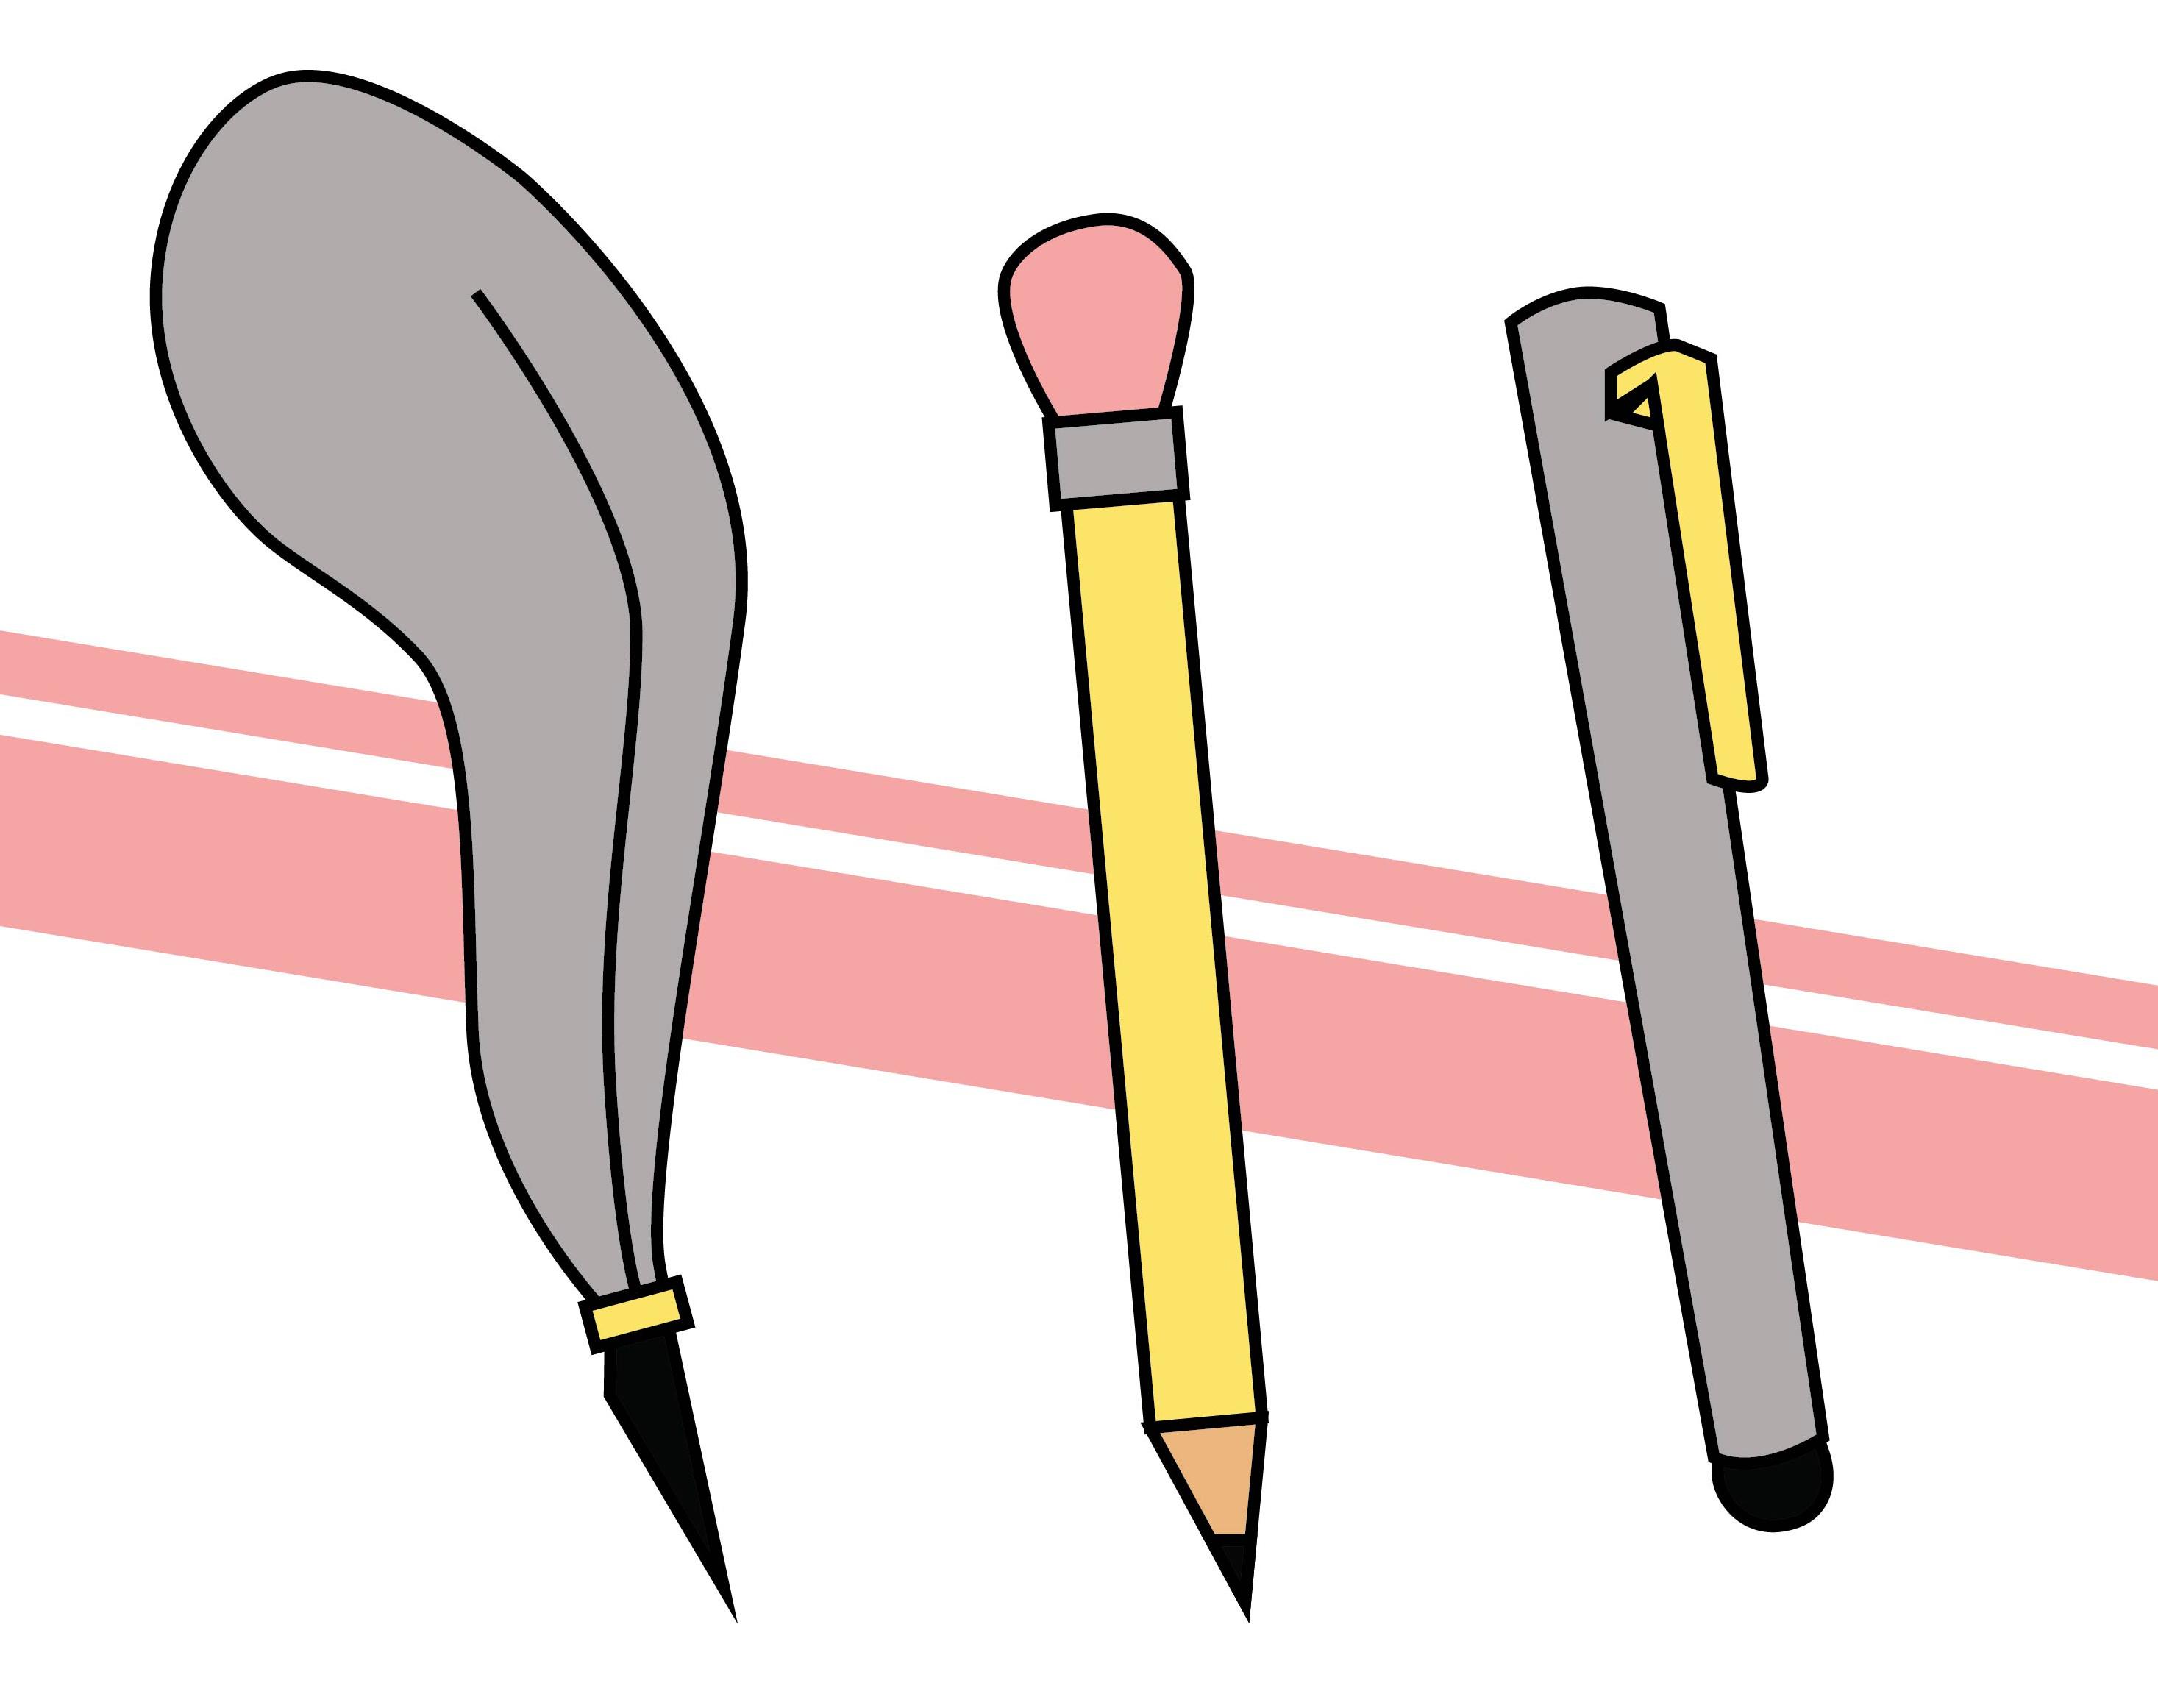 Quill pencil stylus illustration